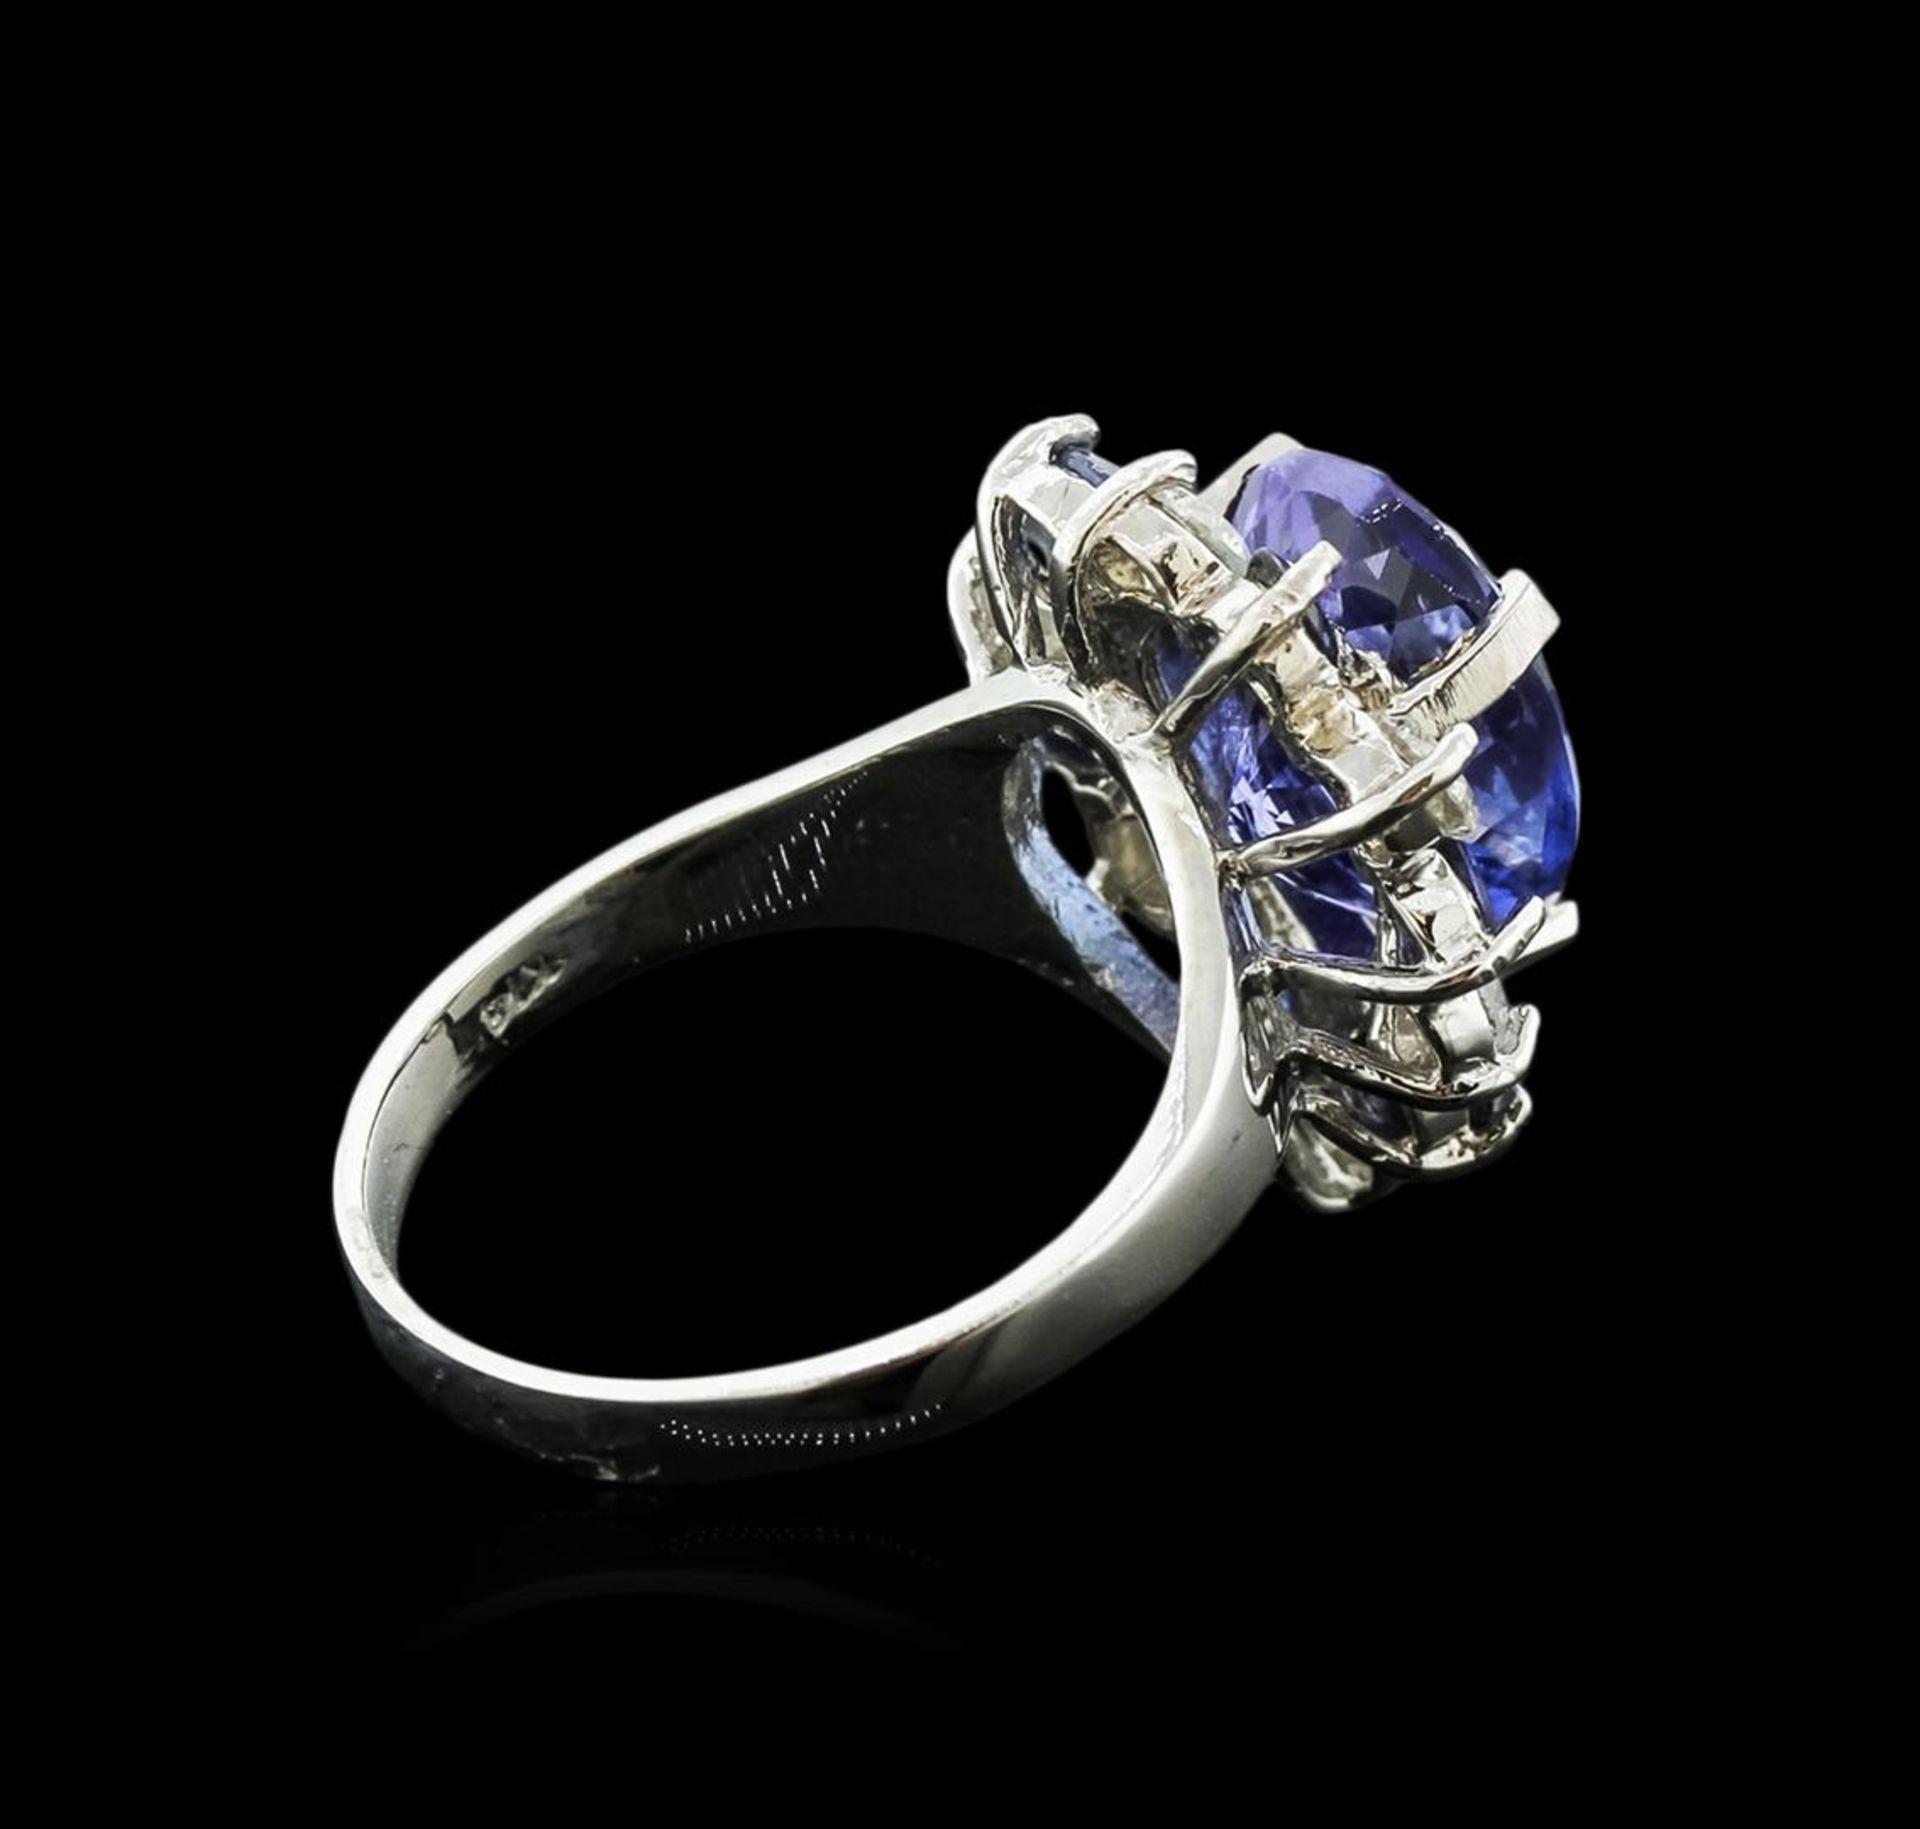 14KT White Gold 4.80 ctw Tanzanite, Sapphire and Diamond Ring - Image 3 of 4